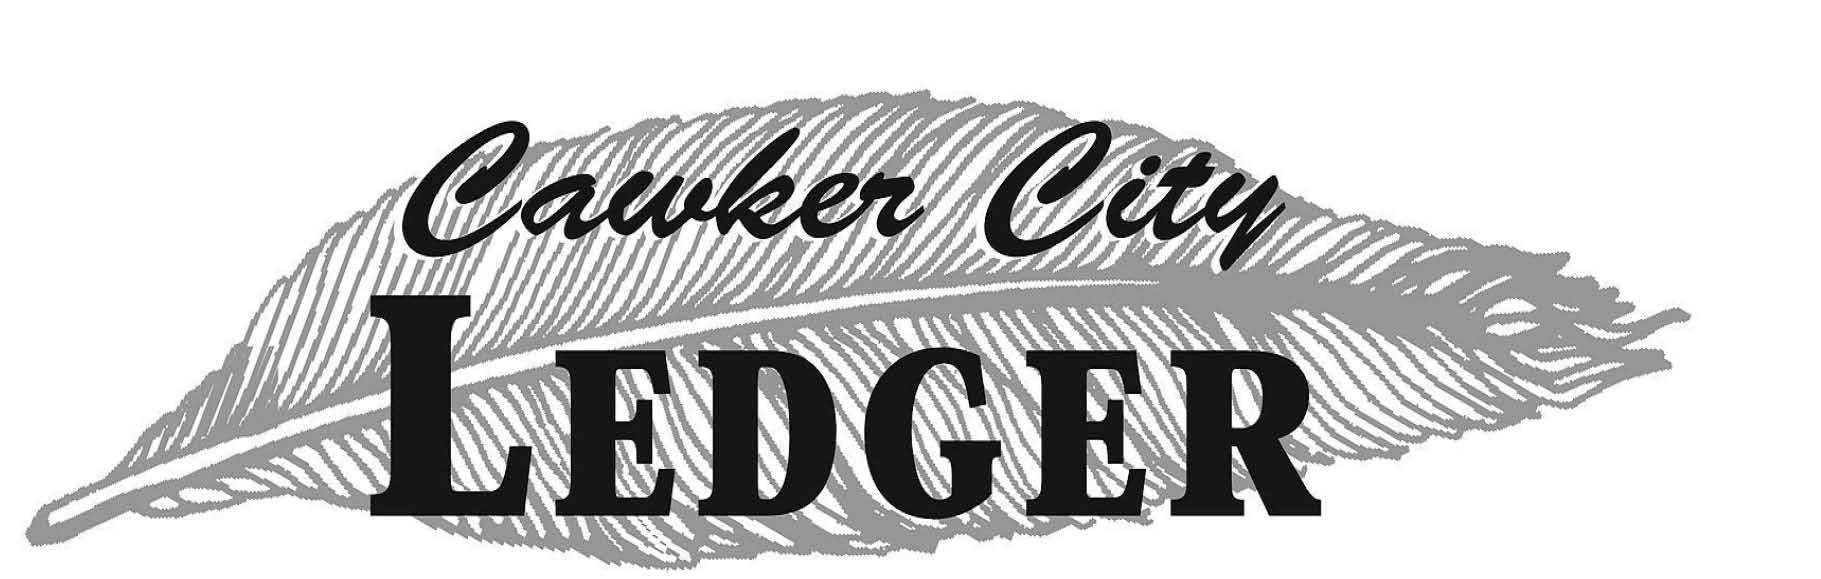 Cawker City Ledger